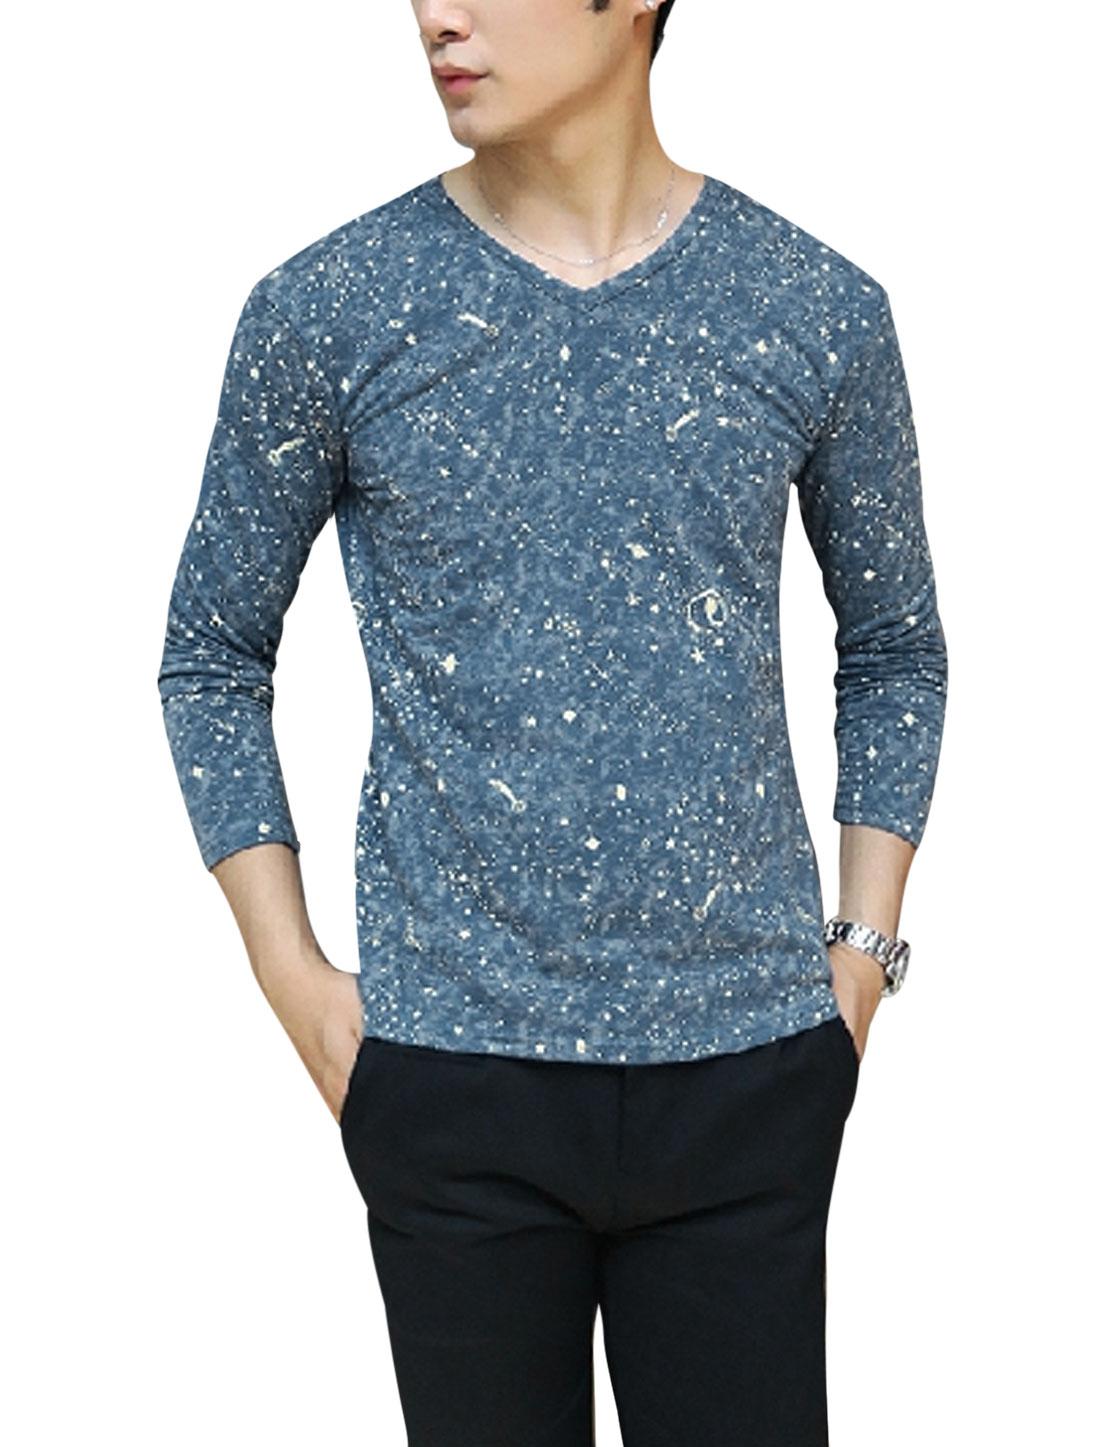 Men Starry Sky Printed V Neck Long Sleeves Cozy Fit T-shirt Blue M